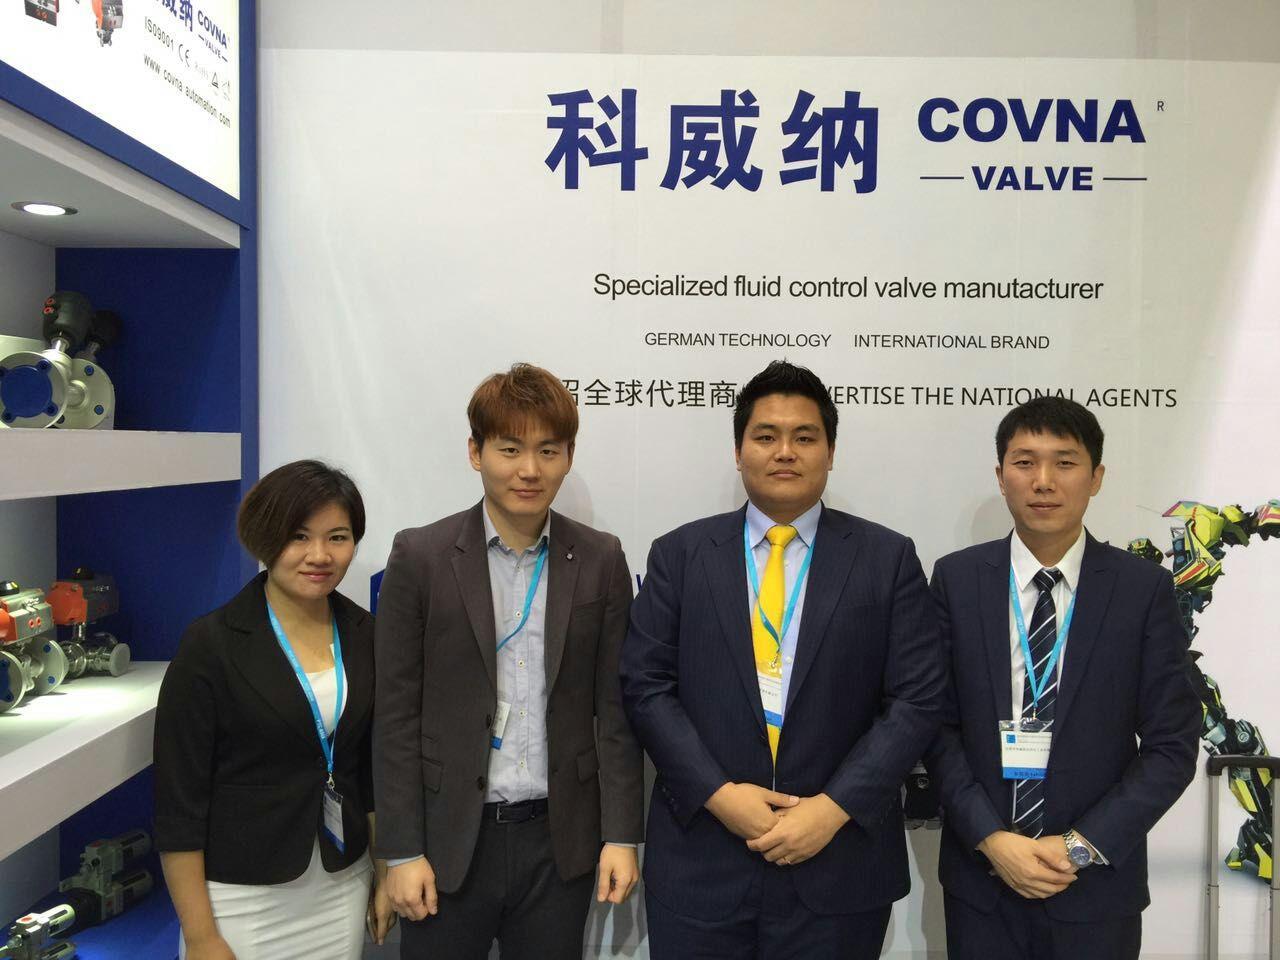 Photo with Korea customers